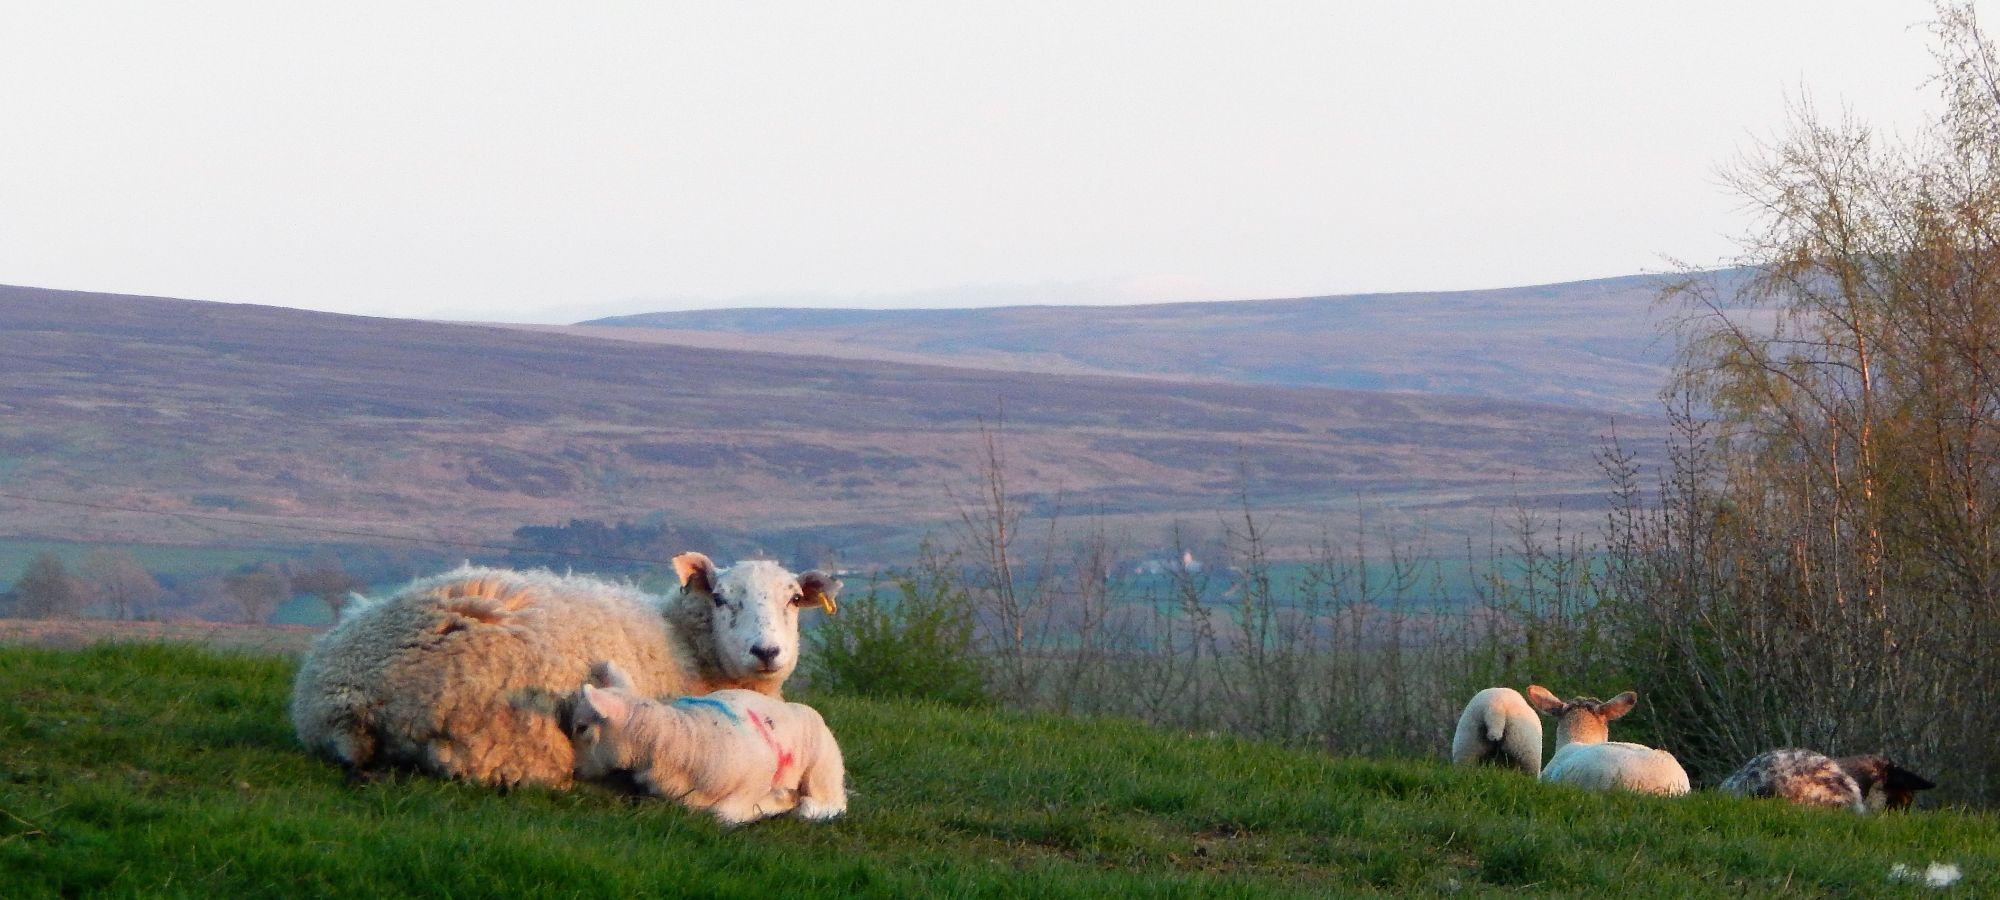 view from Thornbrook Barn towards Burnmoor